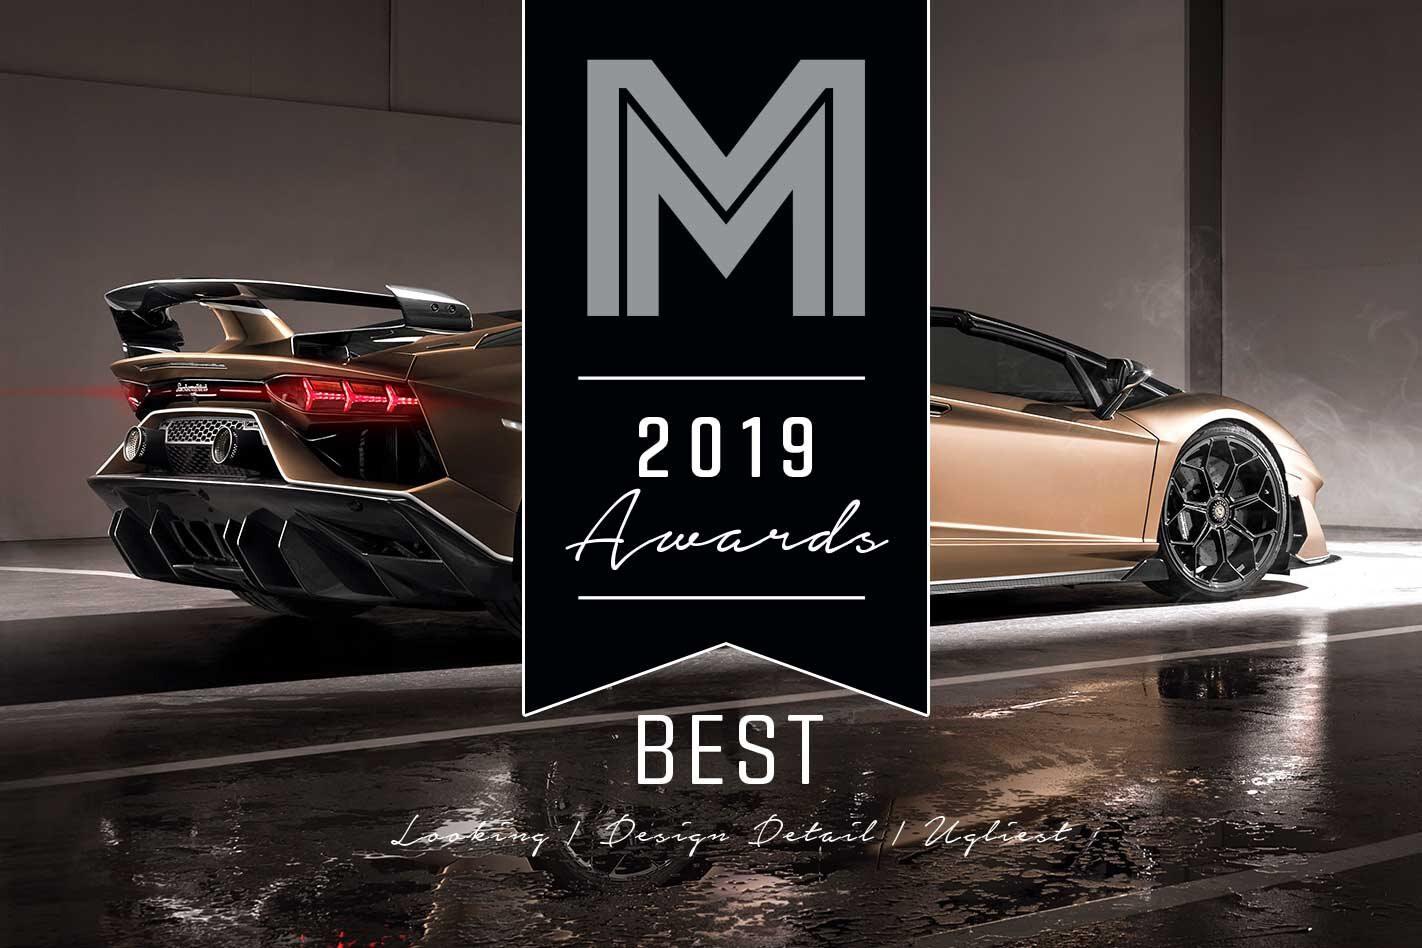 2019 MOTOR Awards Best Looking